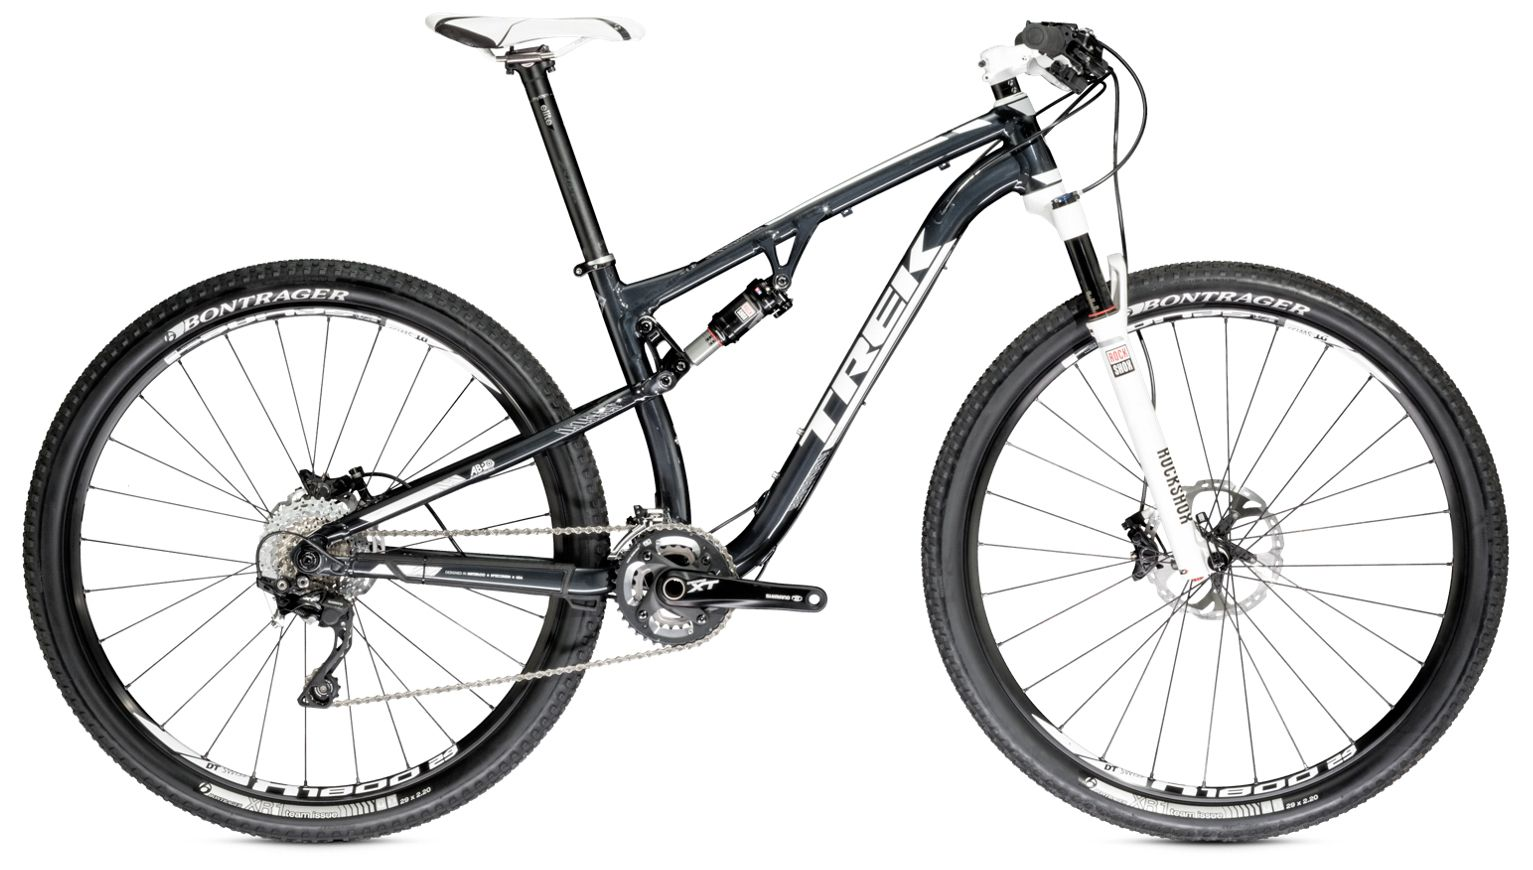 Велосипед Trek Superfly FS 9 2014,  Горные  - артикул:284046